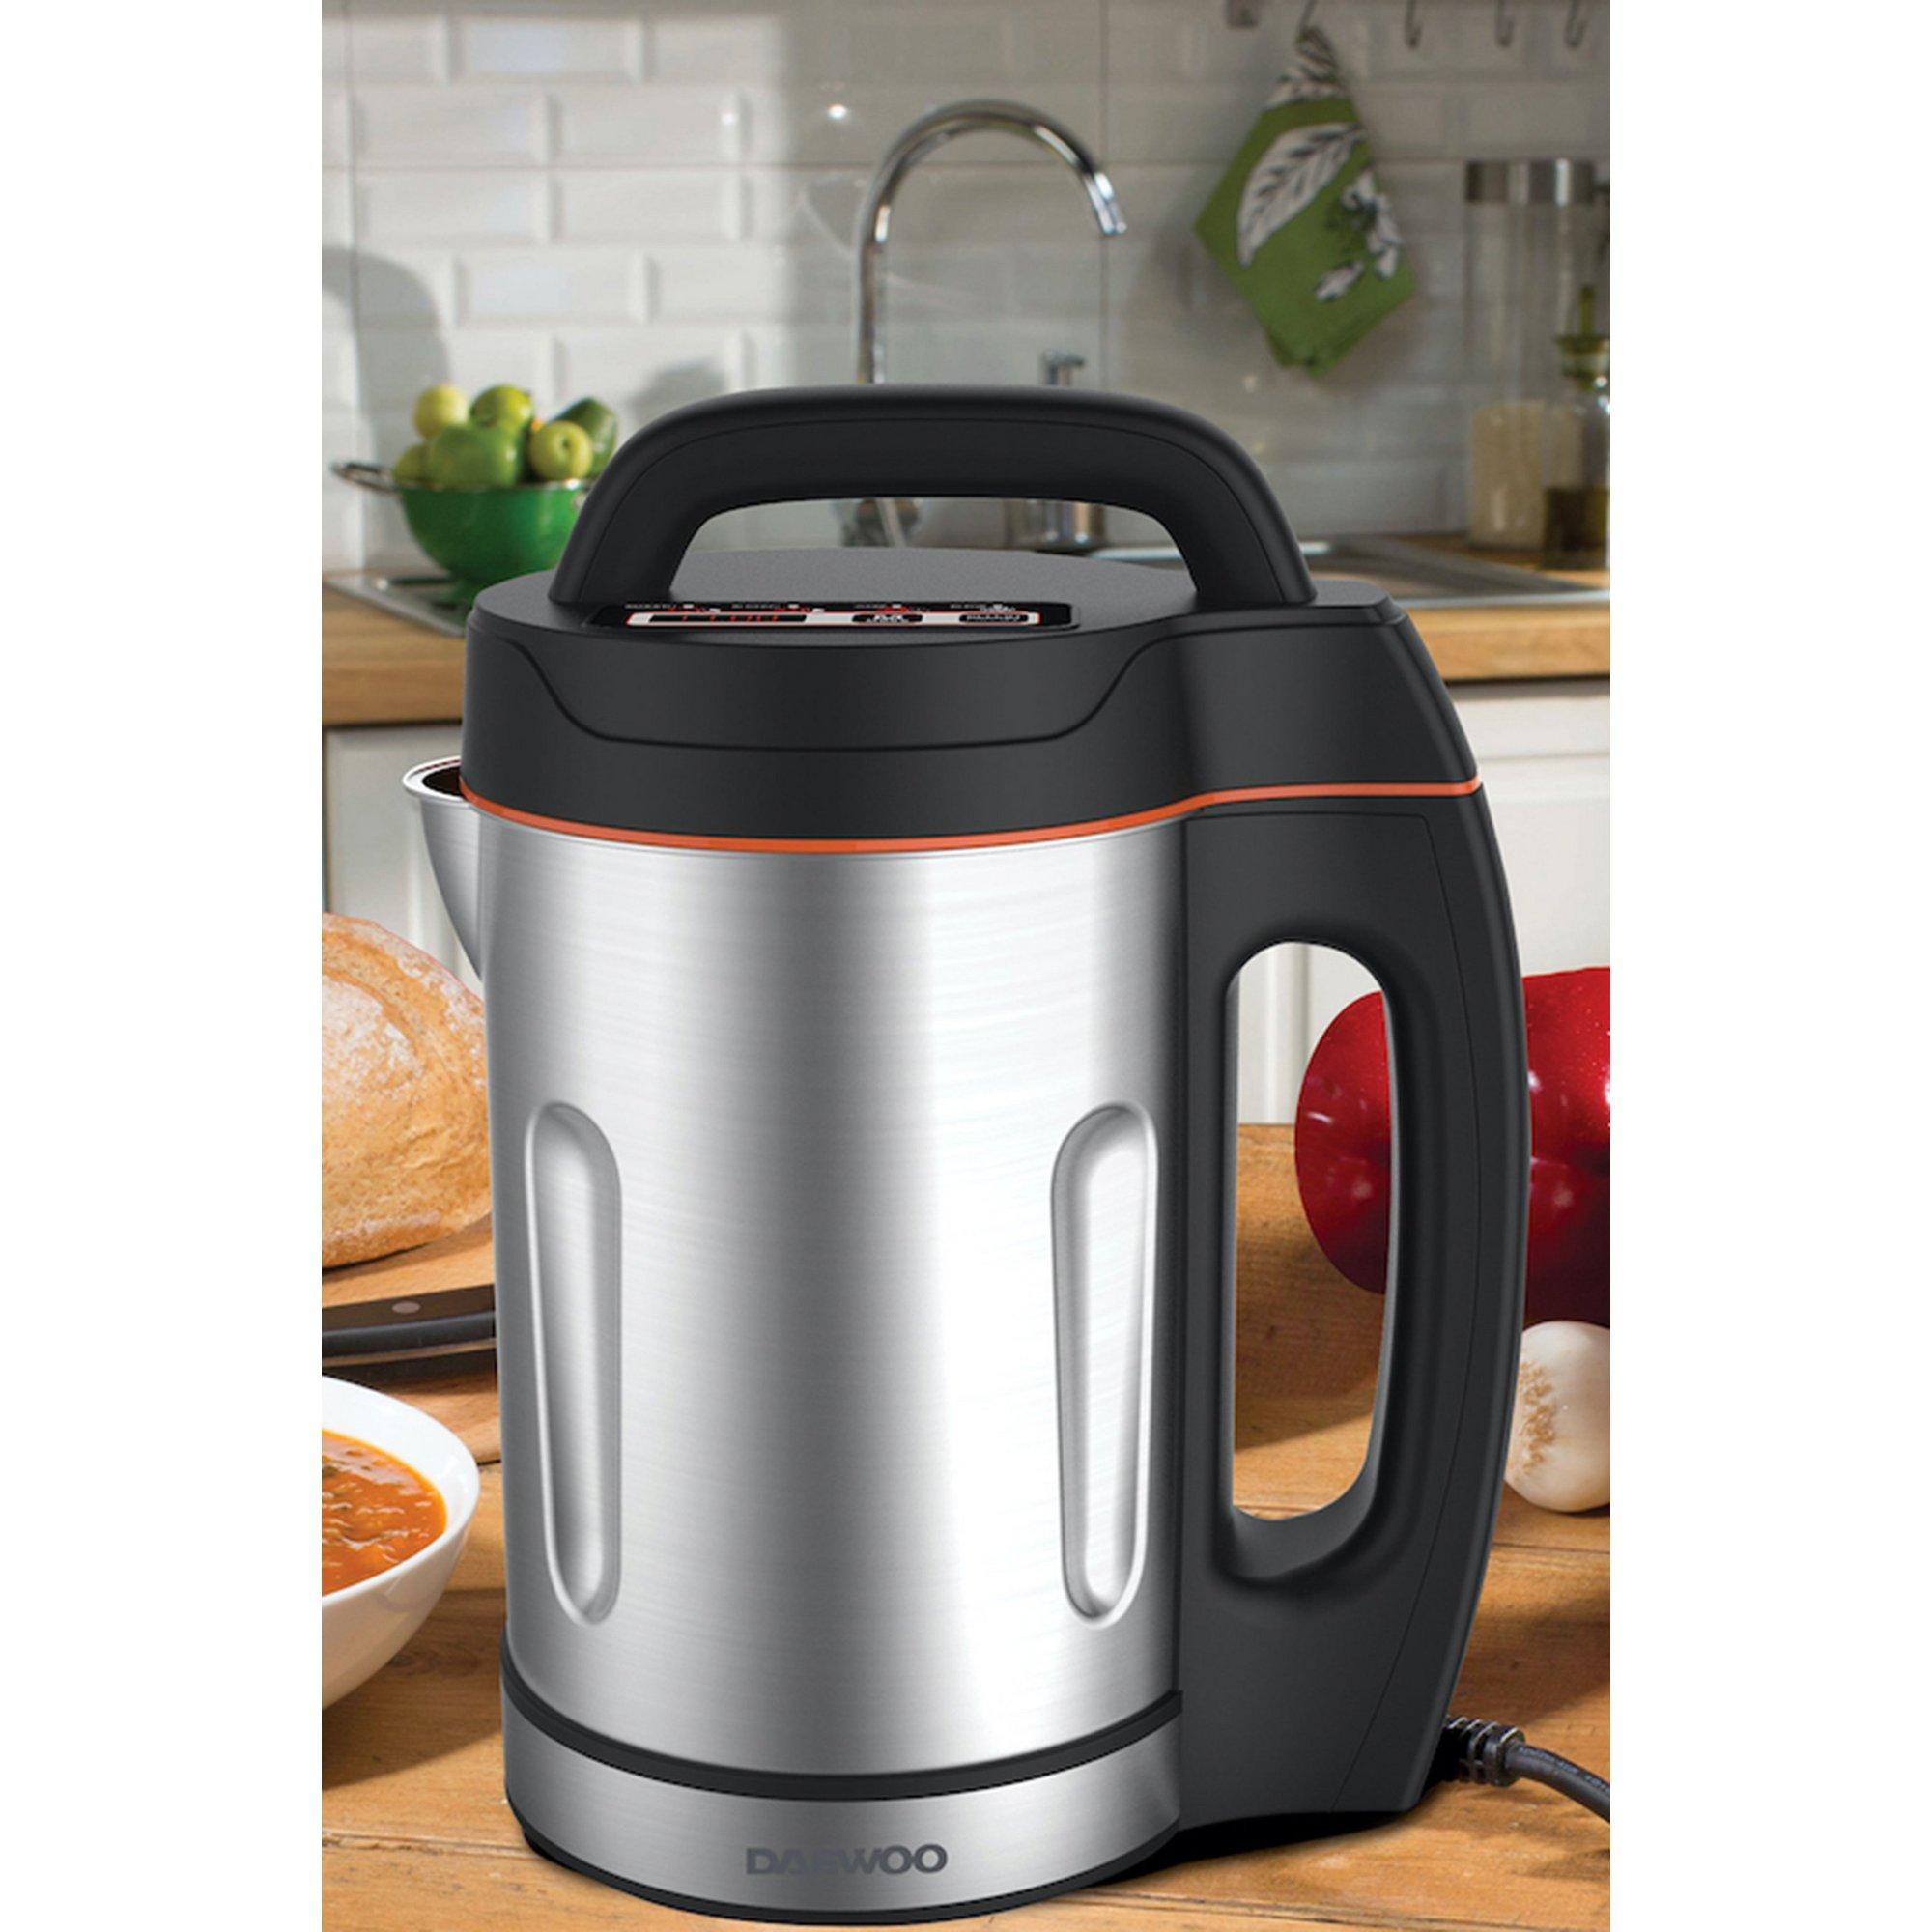 Image of Daewoo 1.6 Litre Soup Maker